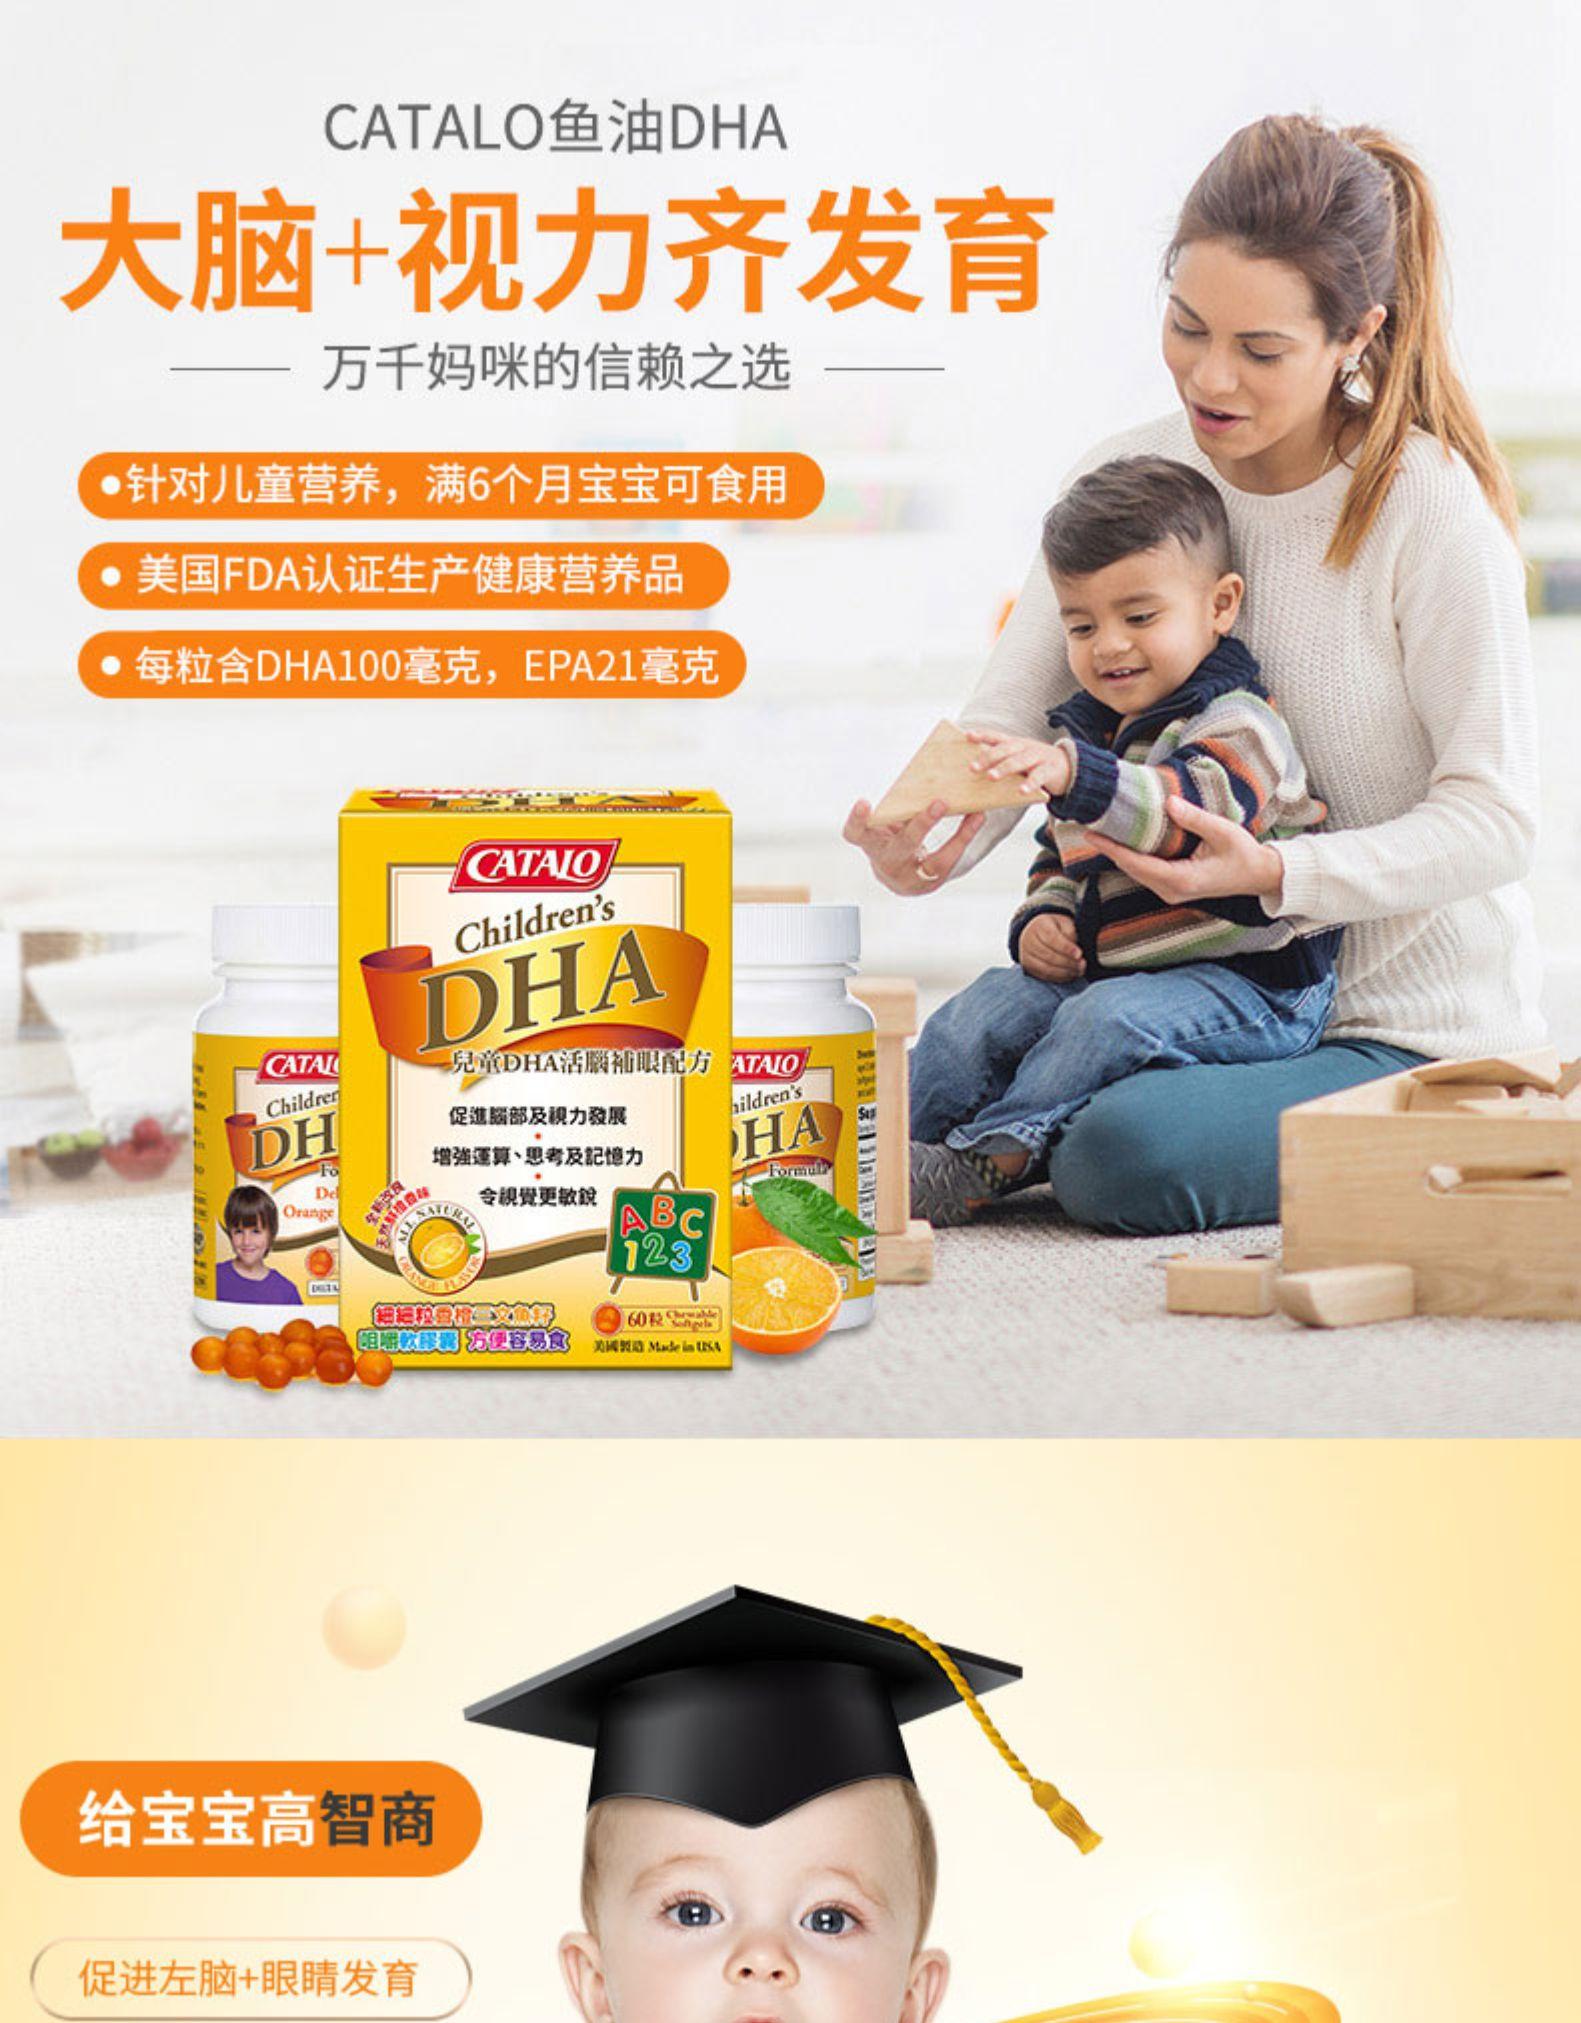 CATALO家得路美国进口儿童鱼油DHA婴幼儿鱼油dha宝宝营养补脑记忆 产品系列 第6张